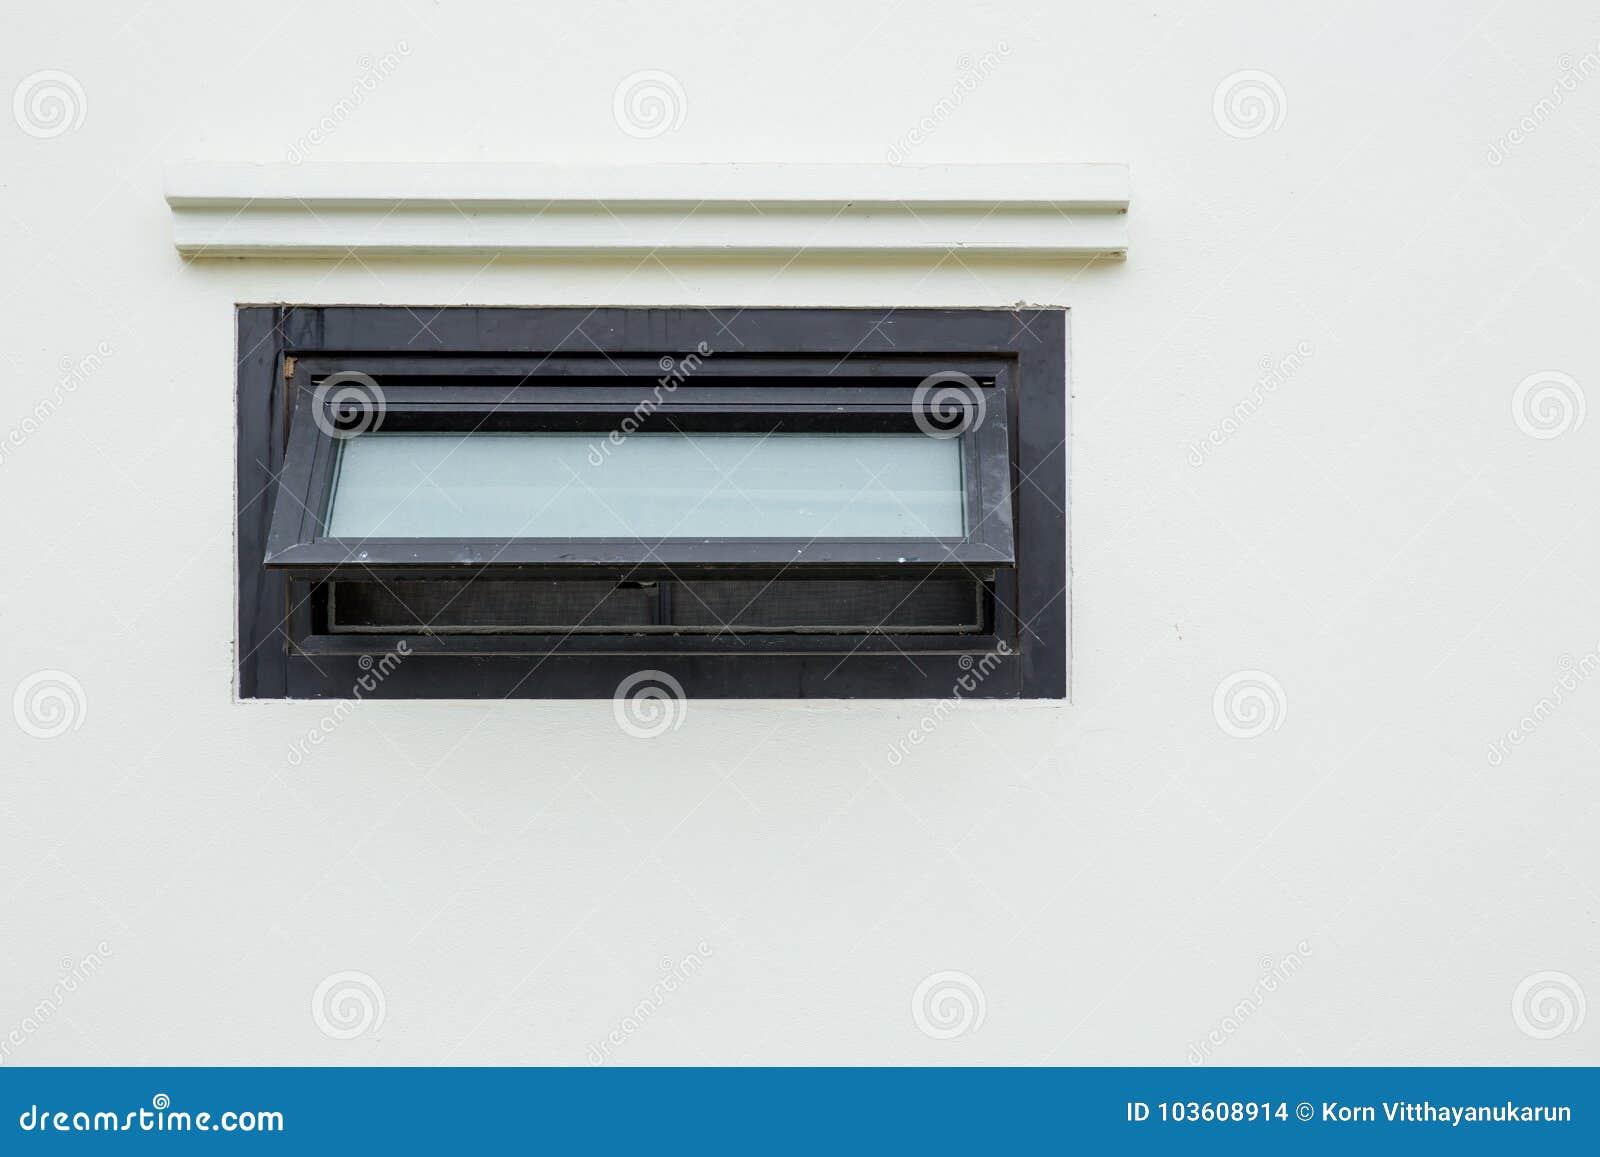 Awning Window Open Modern Home Aluminium Push Vent Windows Air Stock